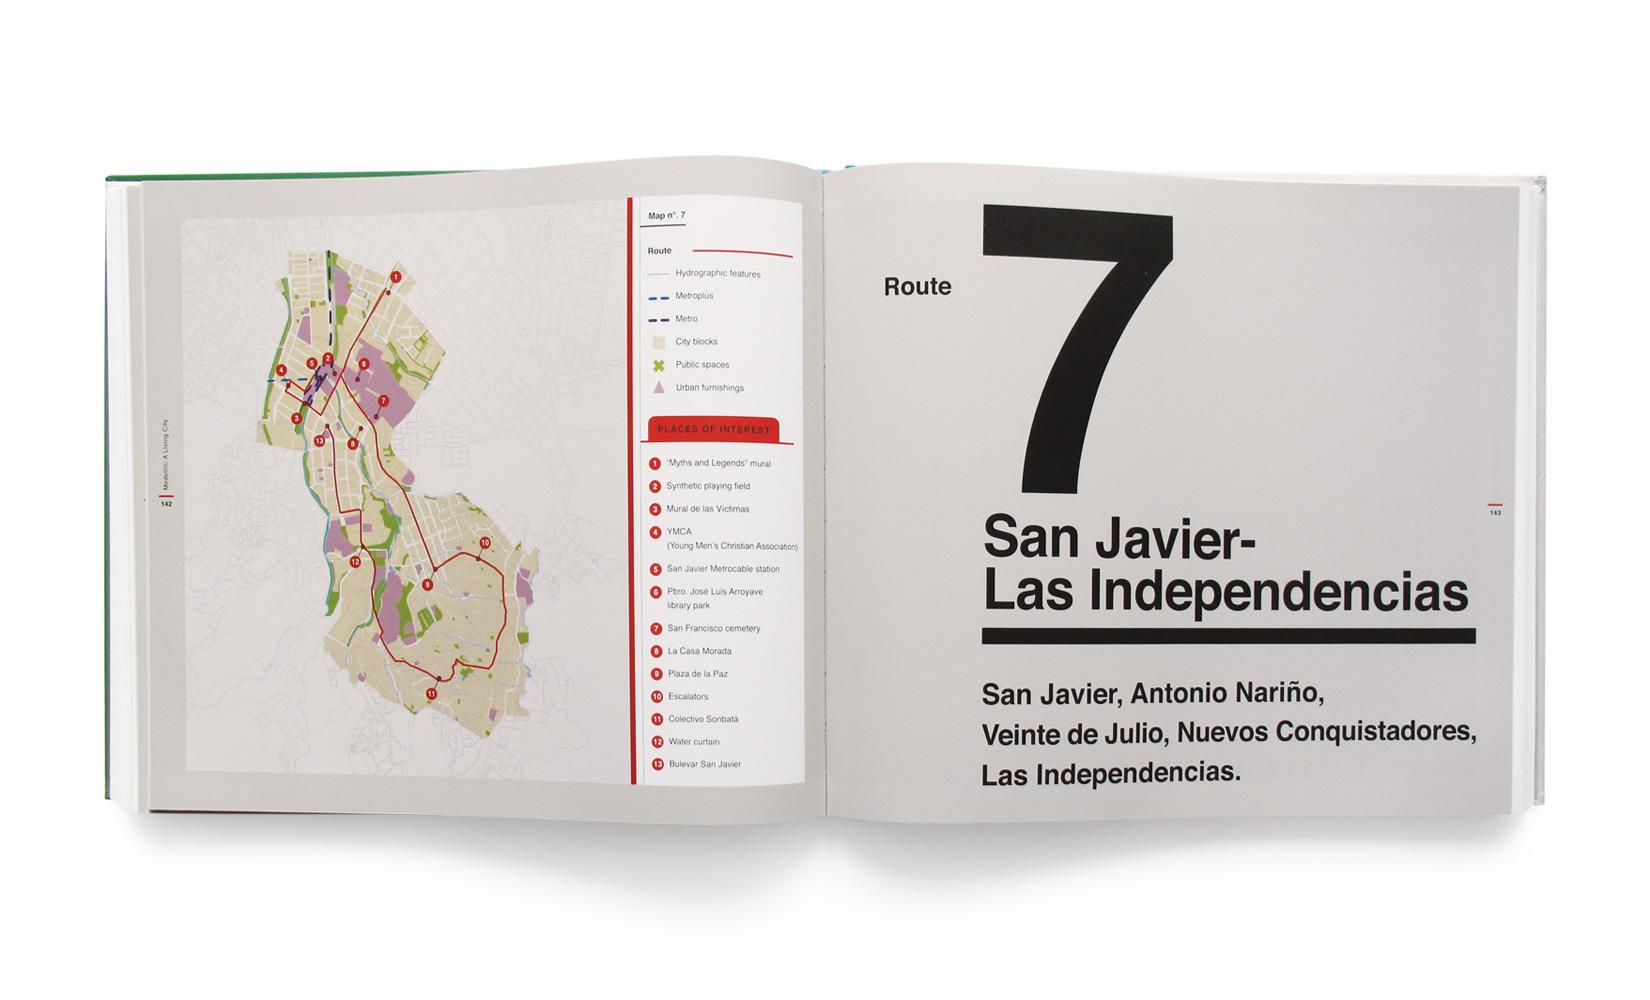 Medellin-p6.jpg